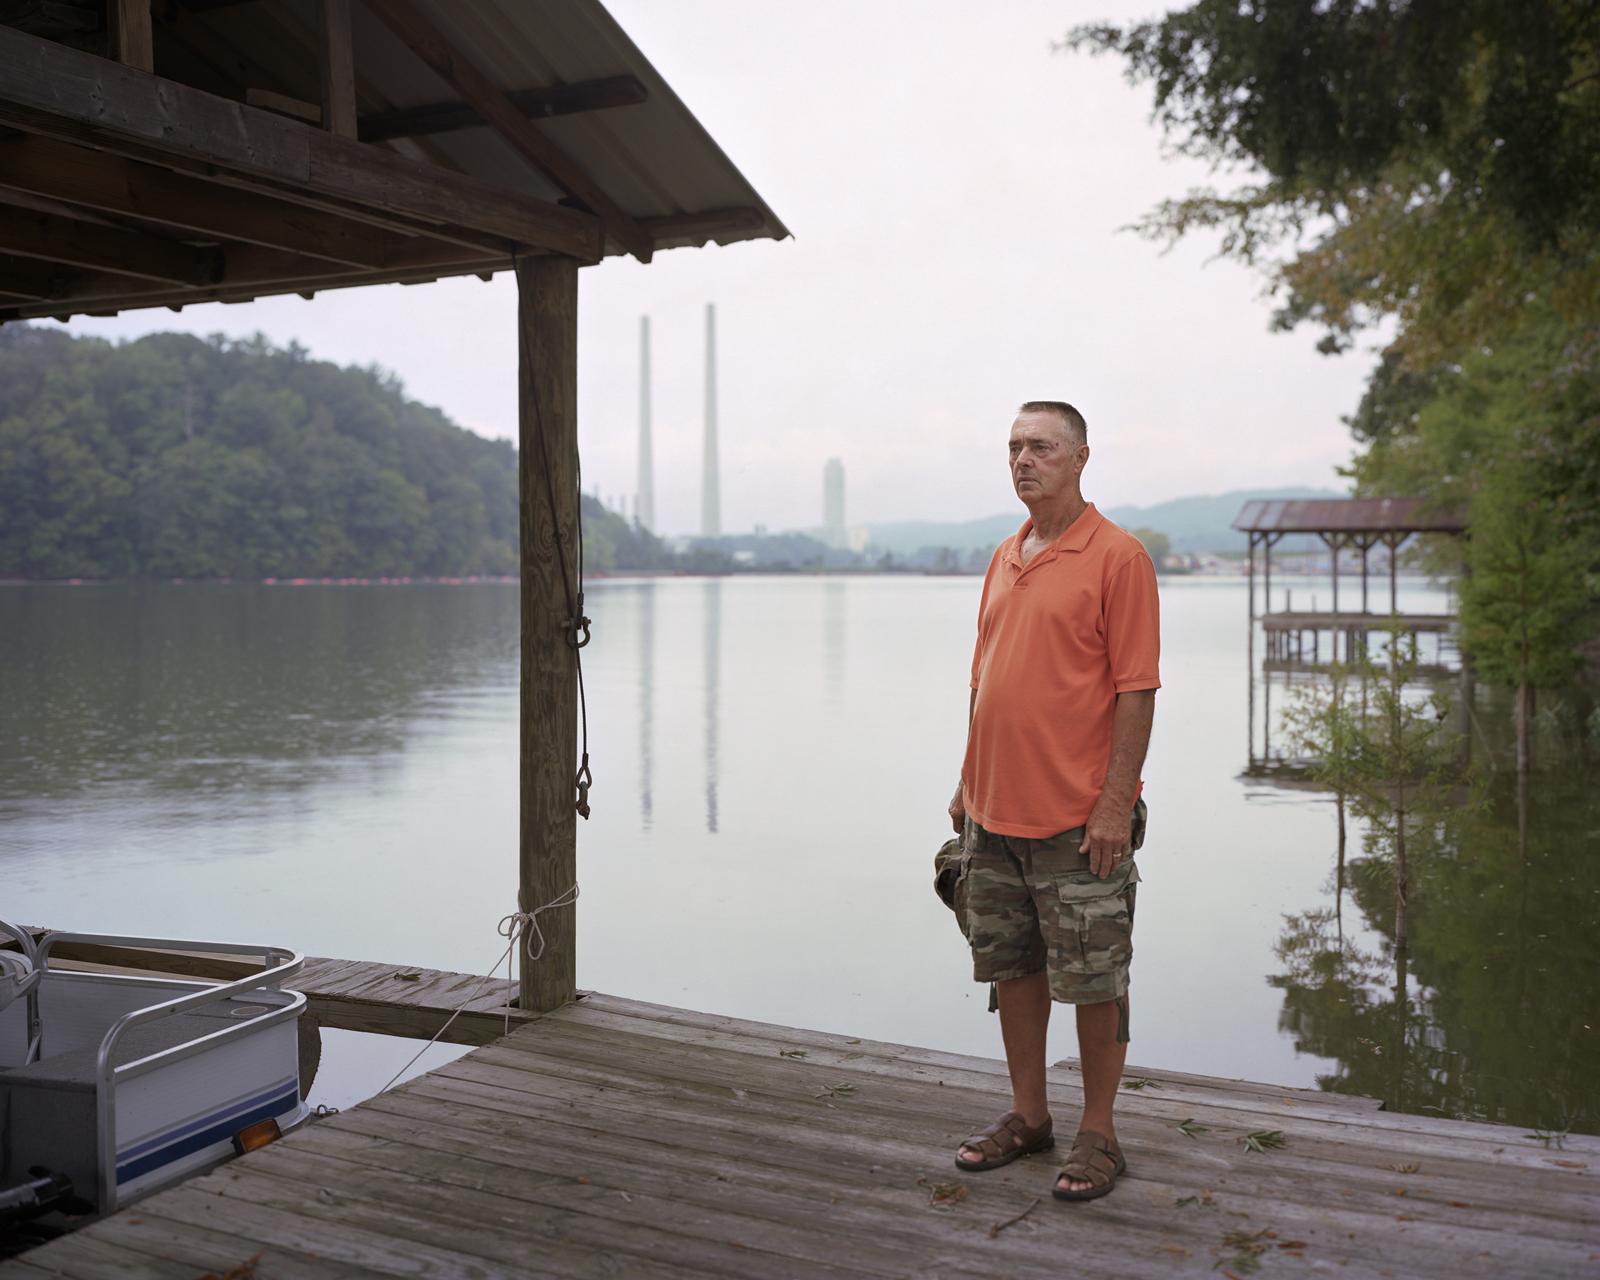 Glenn, Kingston Coal Ash Spill, Clinch River, Tennessee  2009